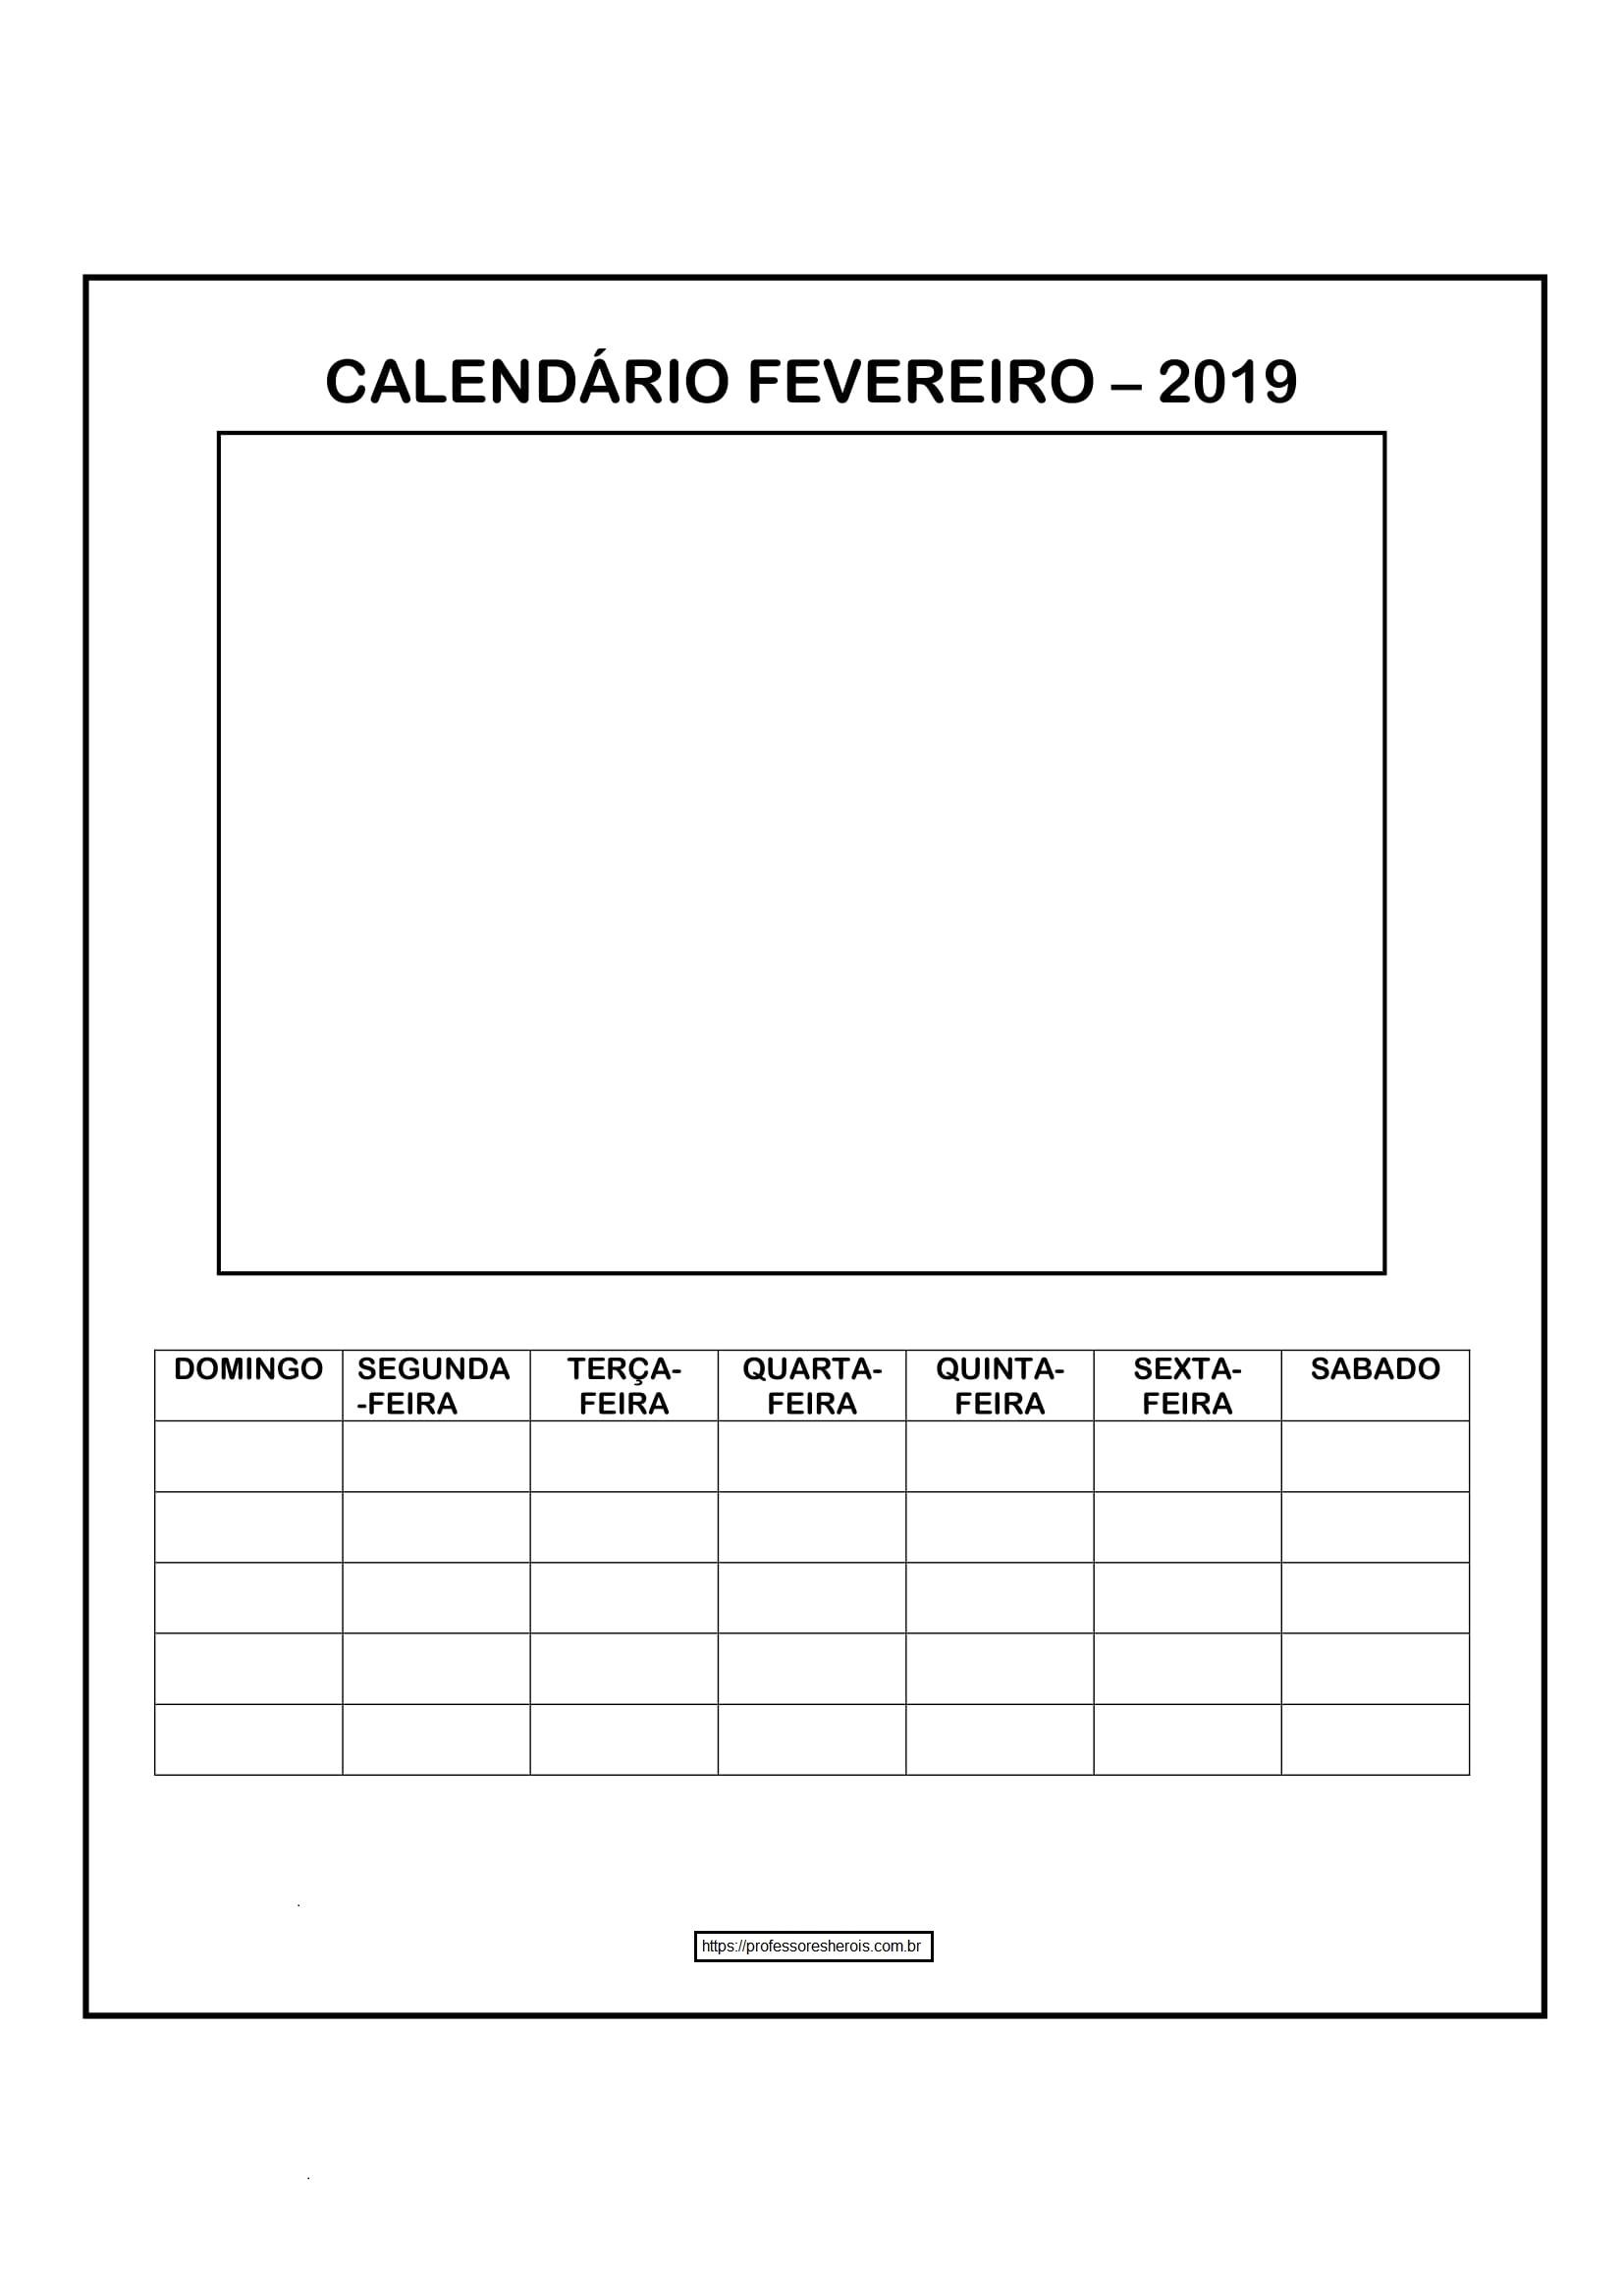 cadendario-para-completar-e-colorir-2019-fevereiro-c-1